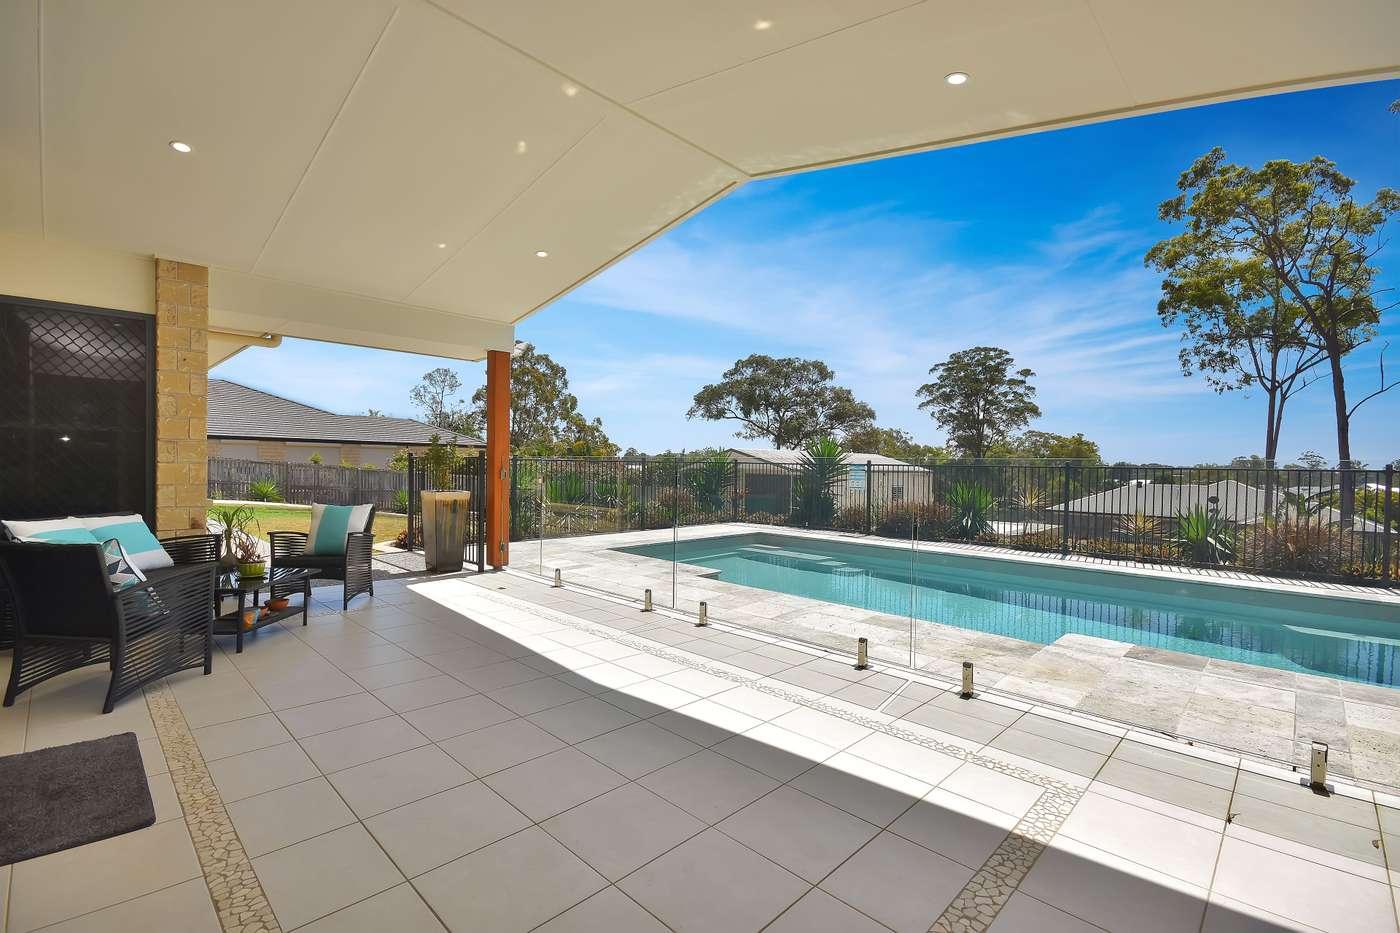 Main view of Homely house listing, 2-4 Julia Street, Narangba, QLD 4504